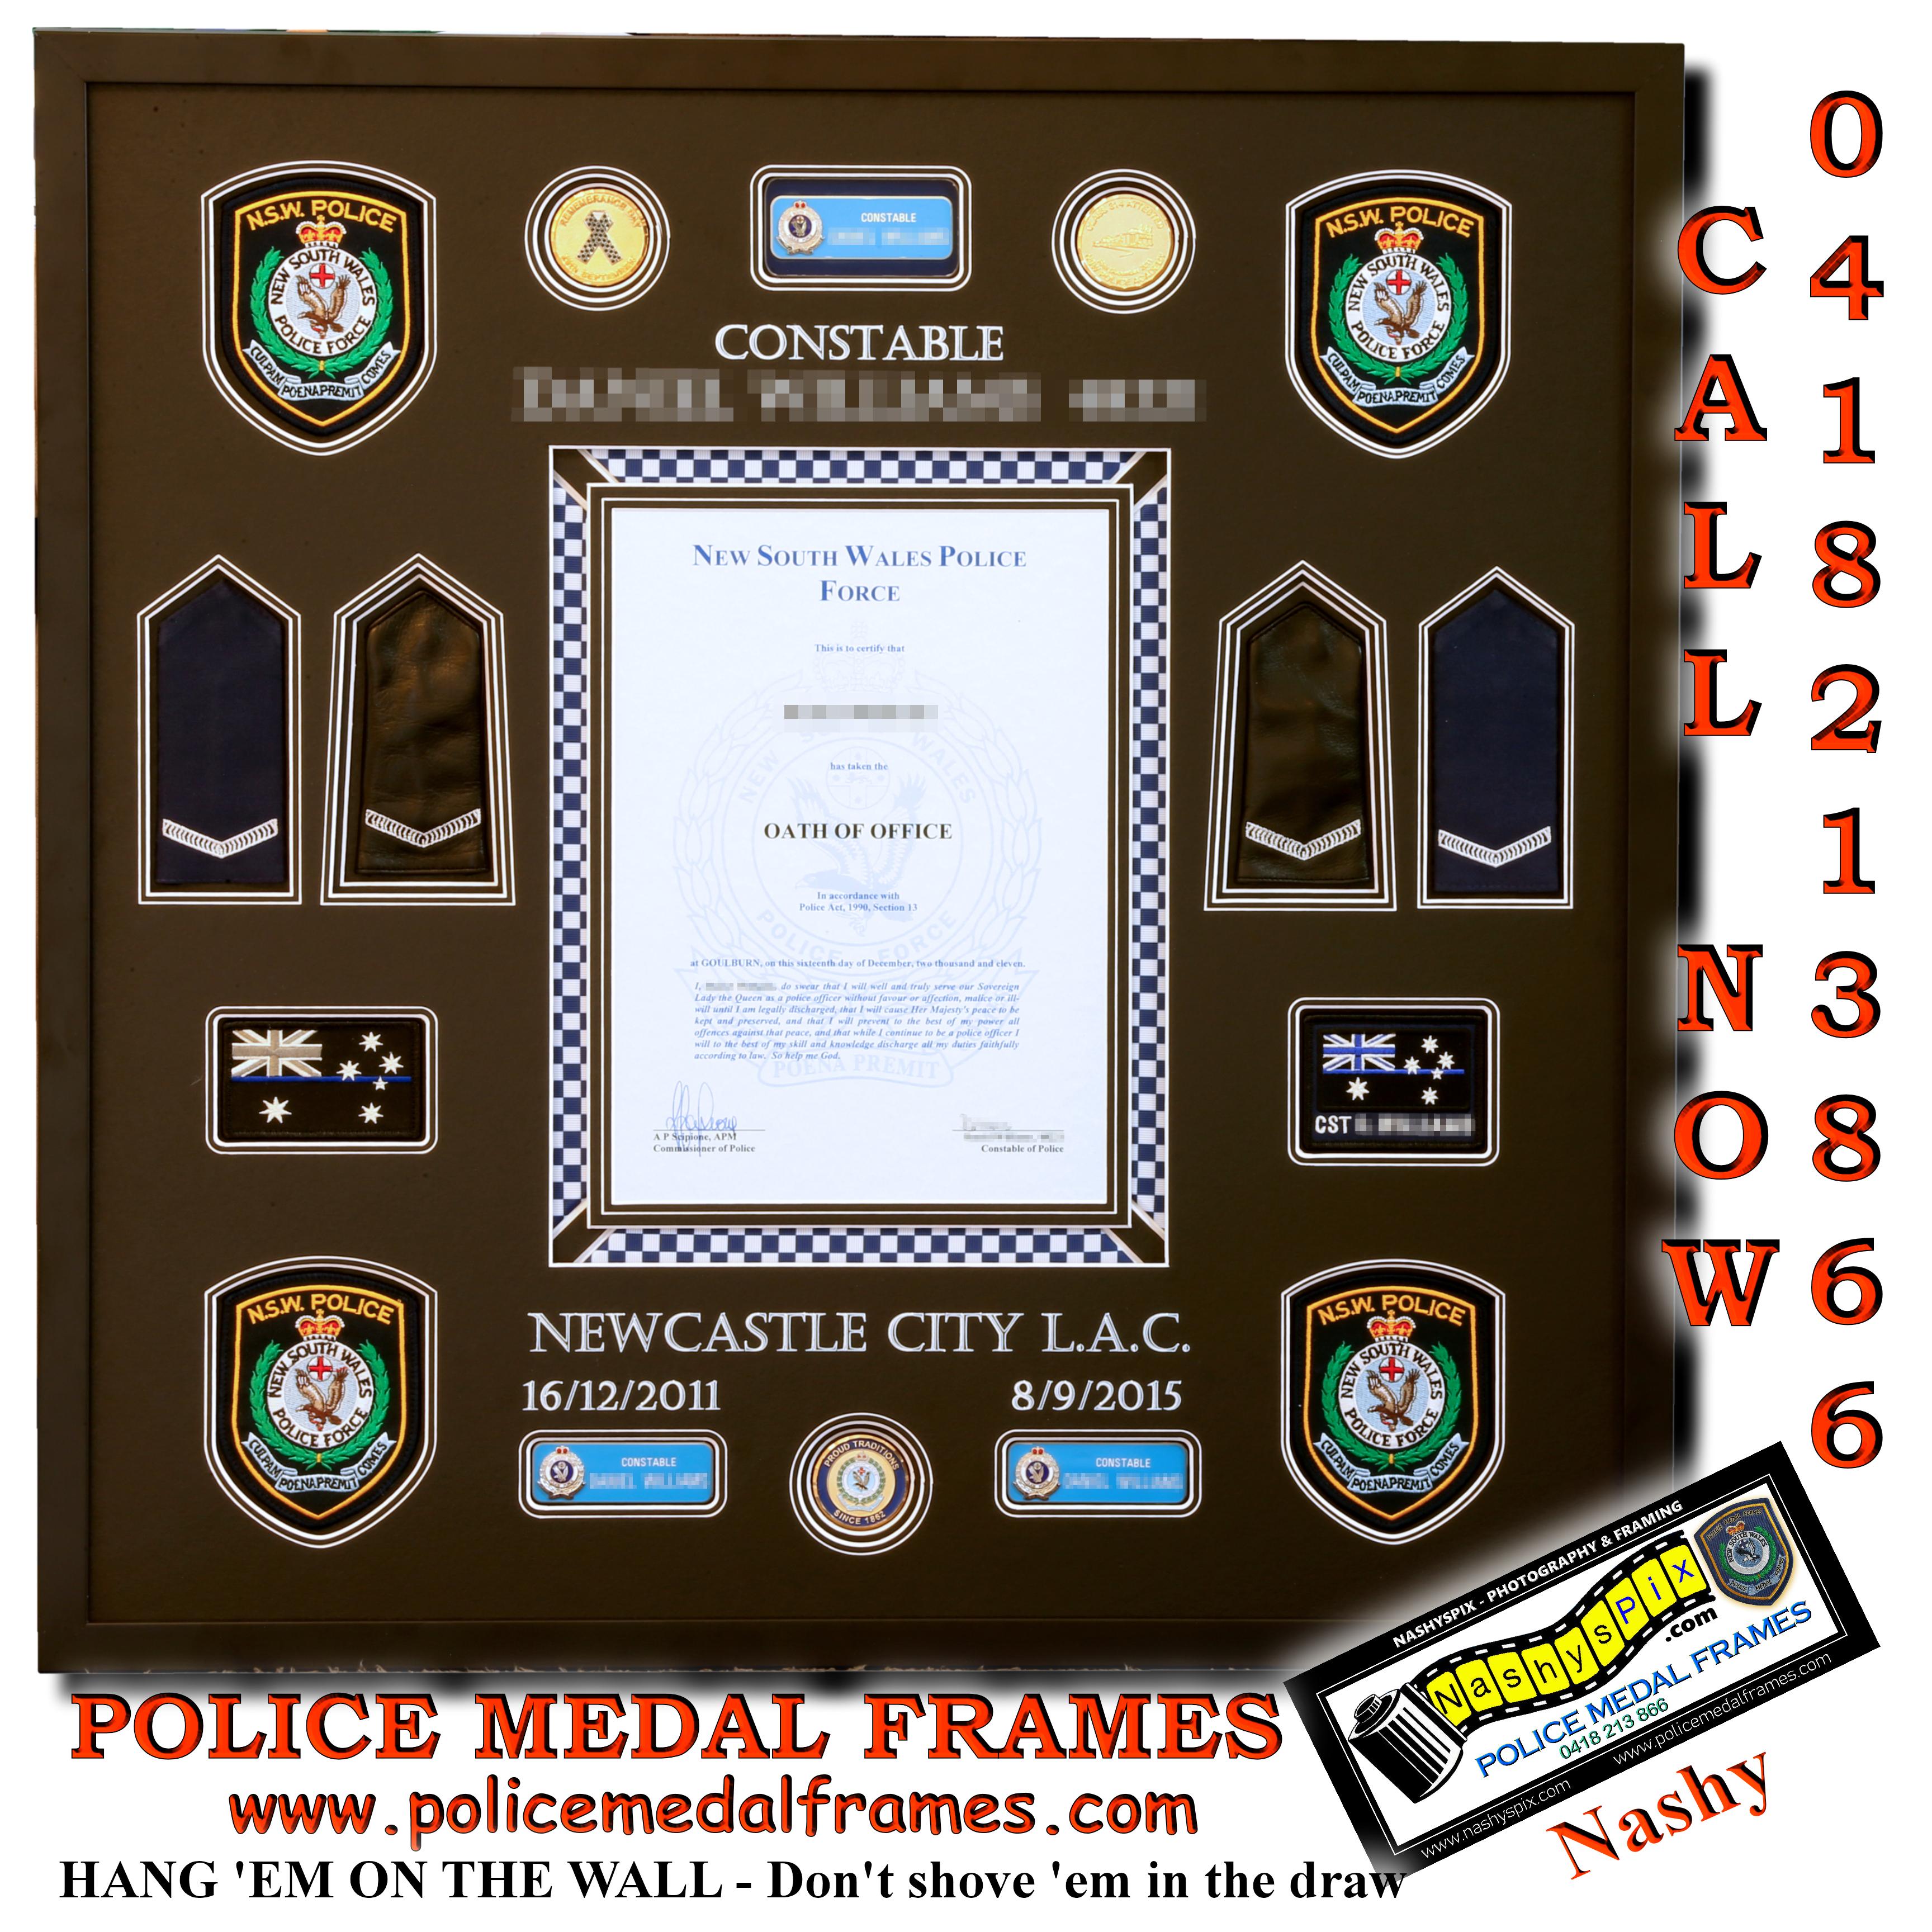 D W Police Frame 8-6-2018